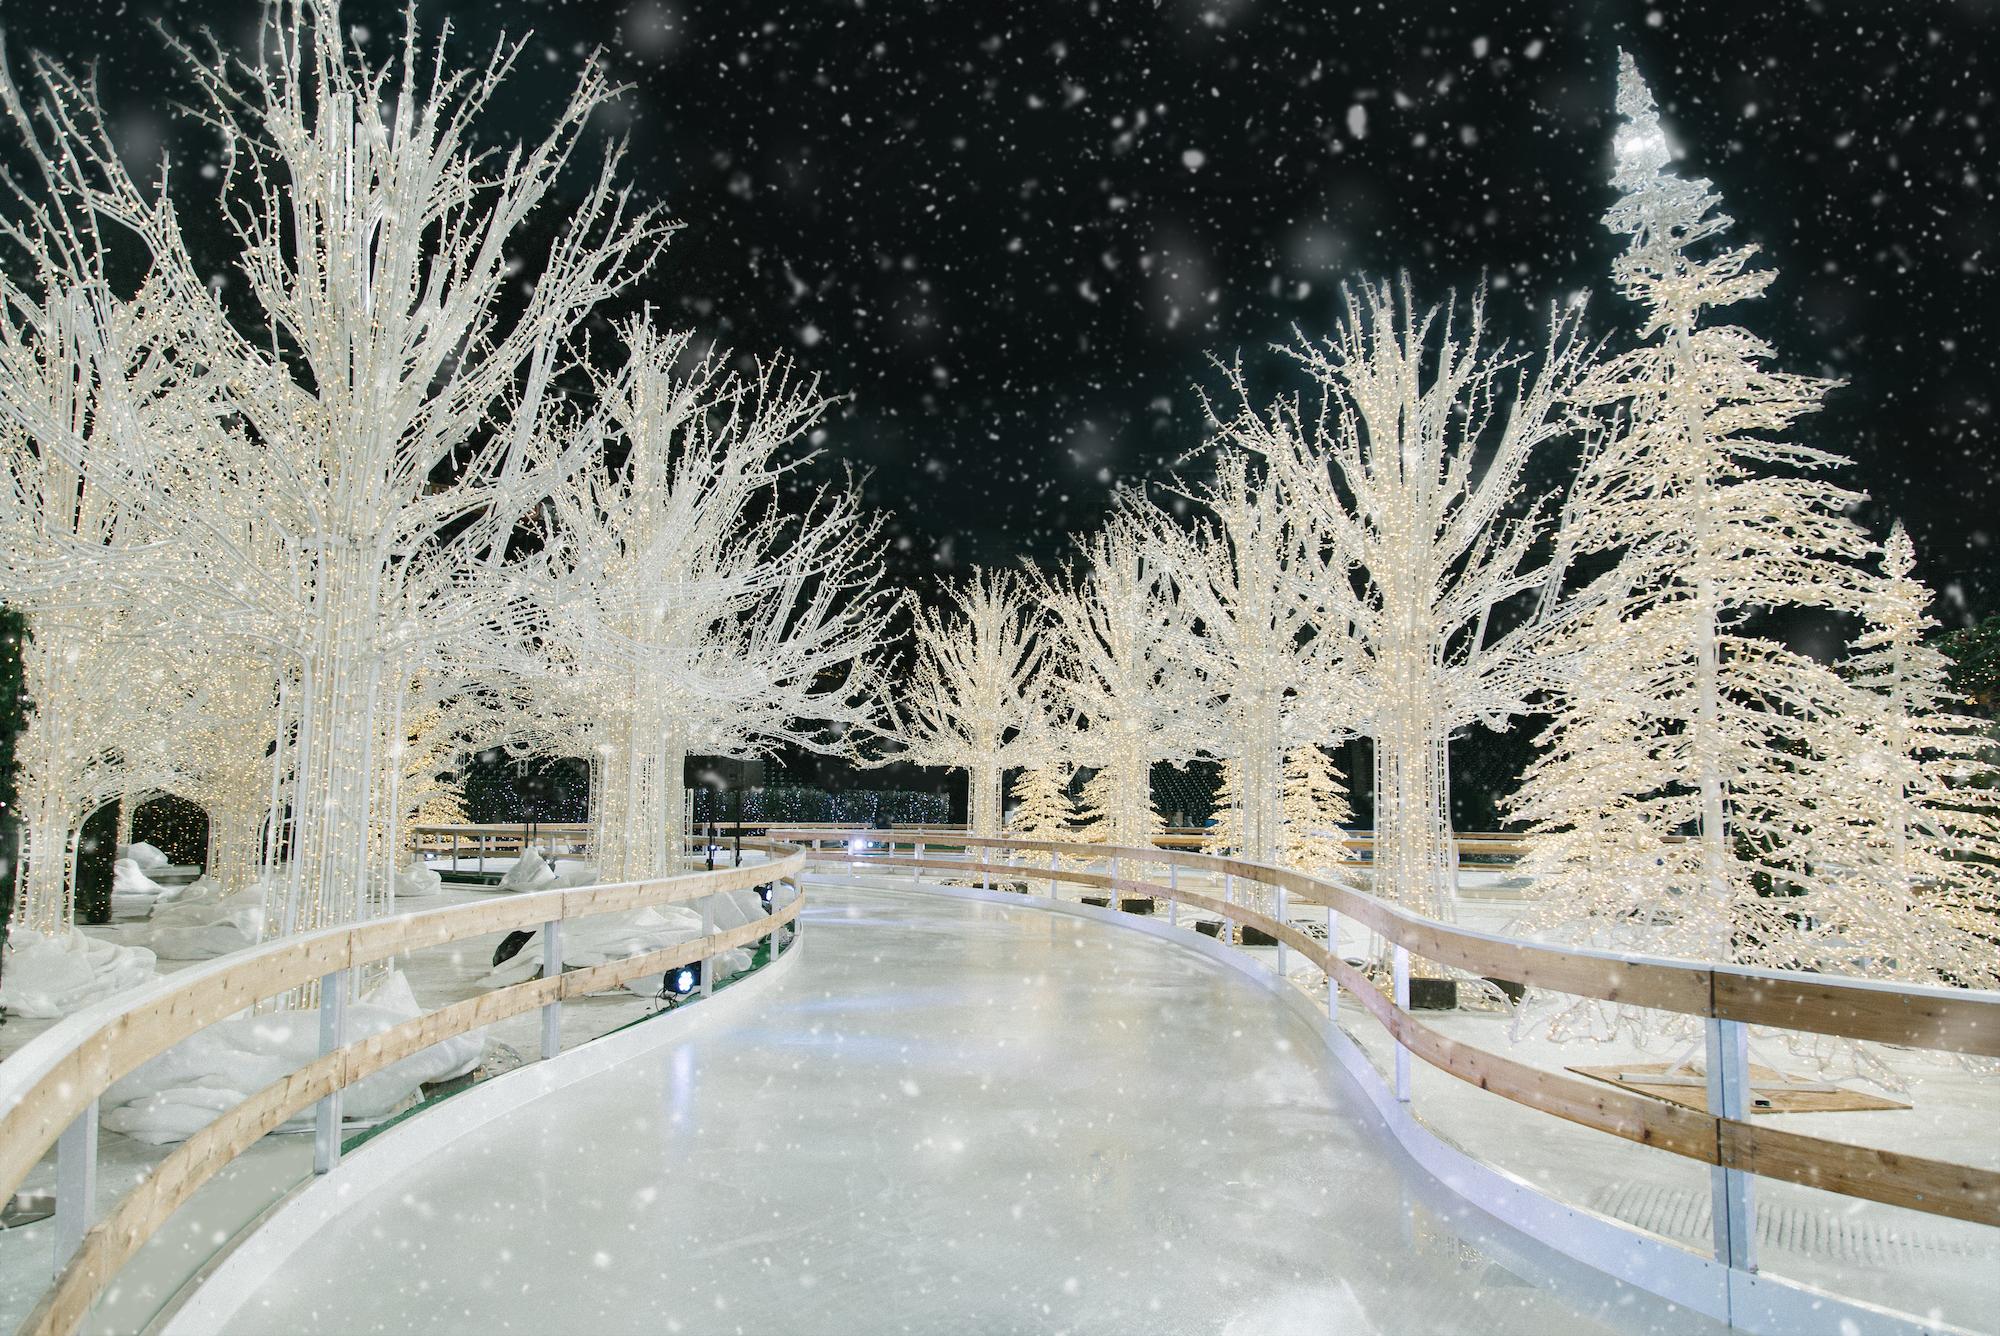 Enchant Ice Rink